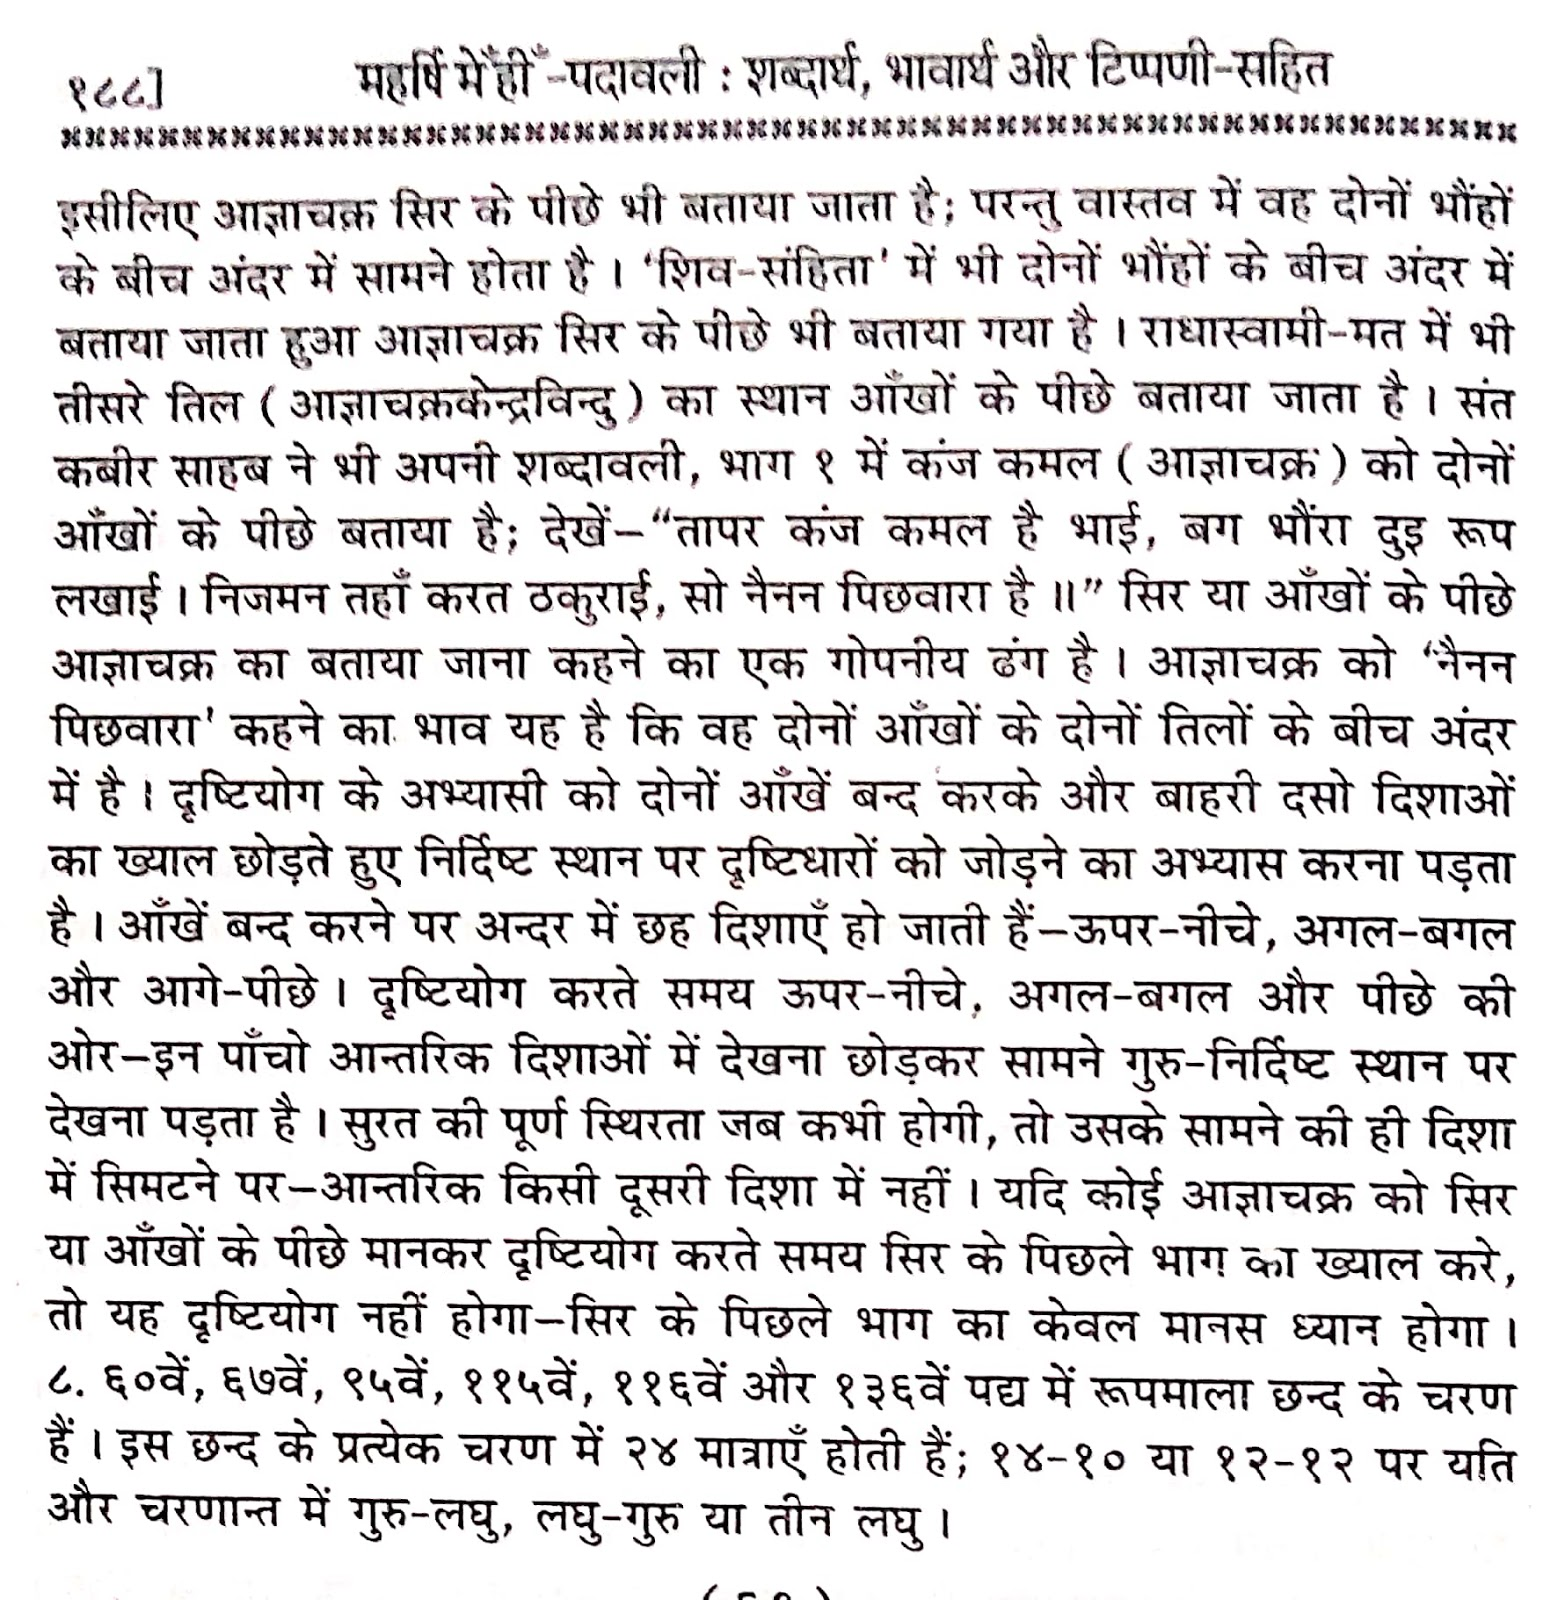 "P60, Complete knowledge of Vindu meditation? ""अध: ऊर्ध्व अरु दांएं बांएं।..."" महर्षि मेंहीं पदावली अर्थ सहित। पदावली भजन 60 का शब्दार्थ, भावार्थ और  टिप्पणी समाप्त।"